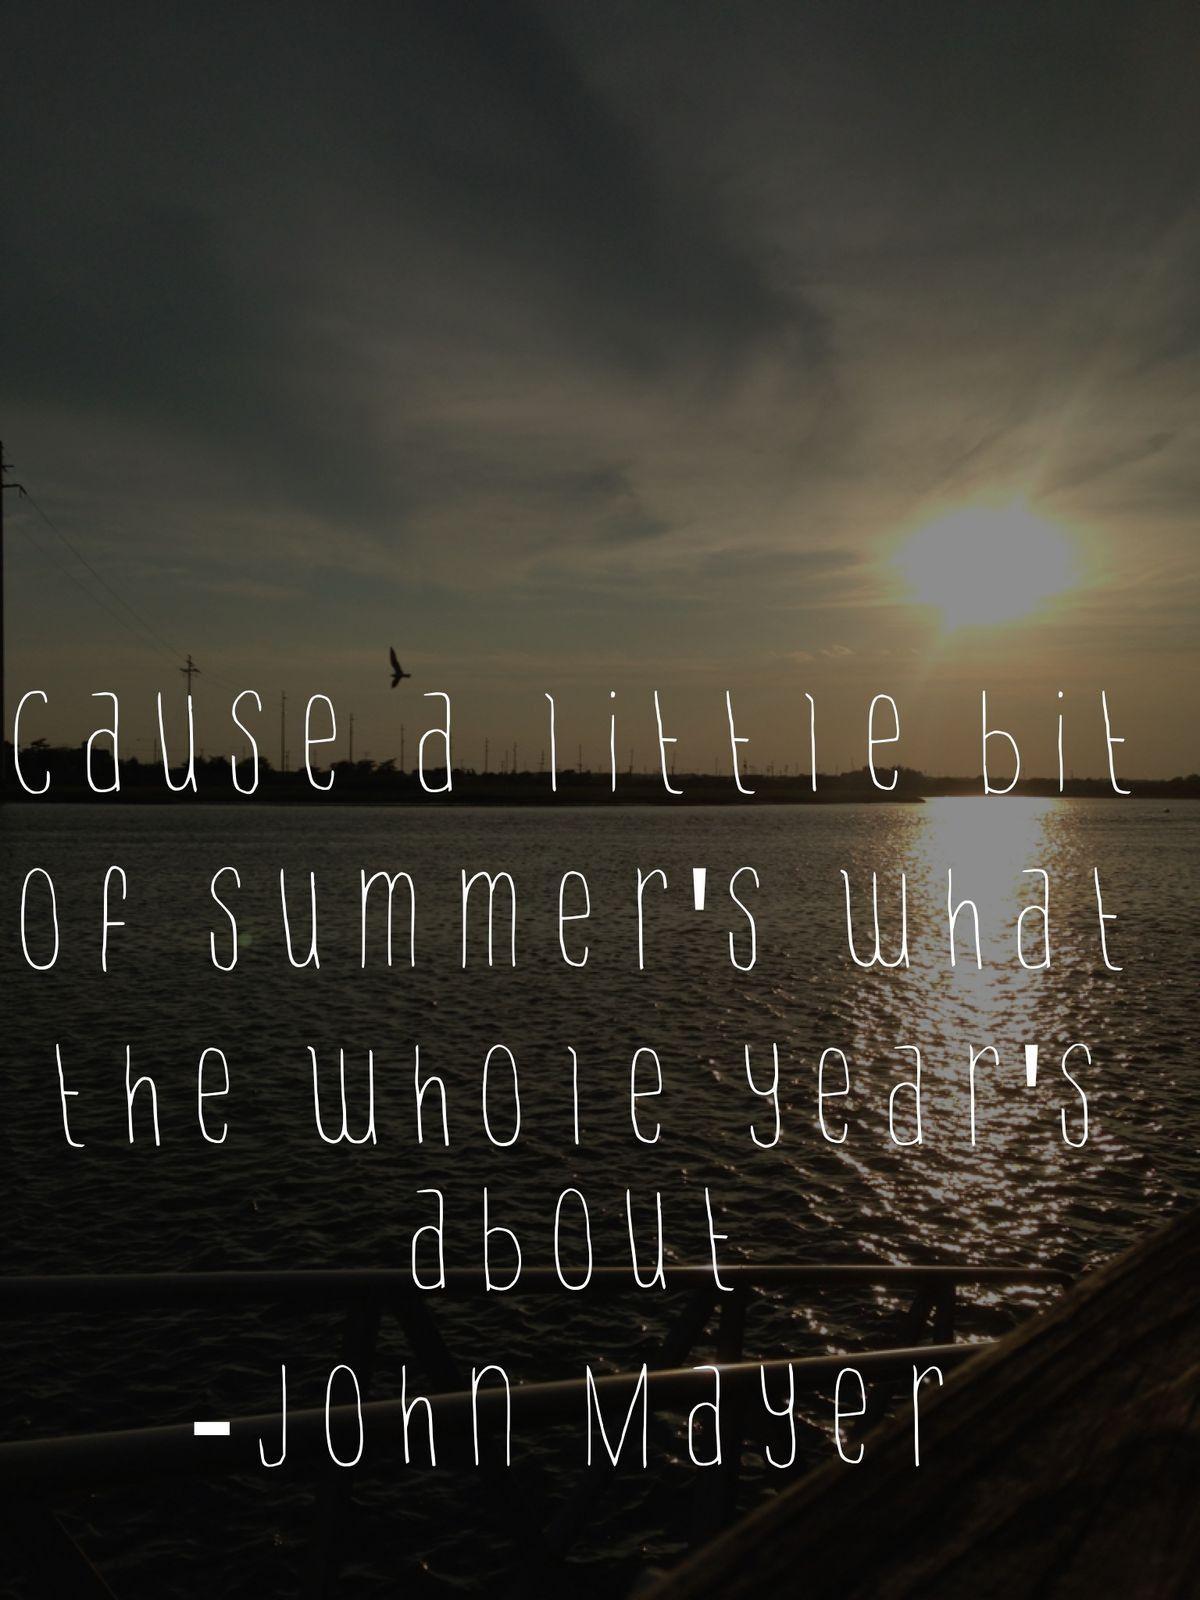 John Mayer - Wildfire Lyrics | Musixmatch